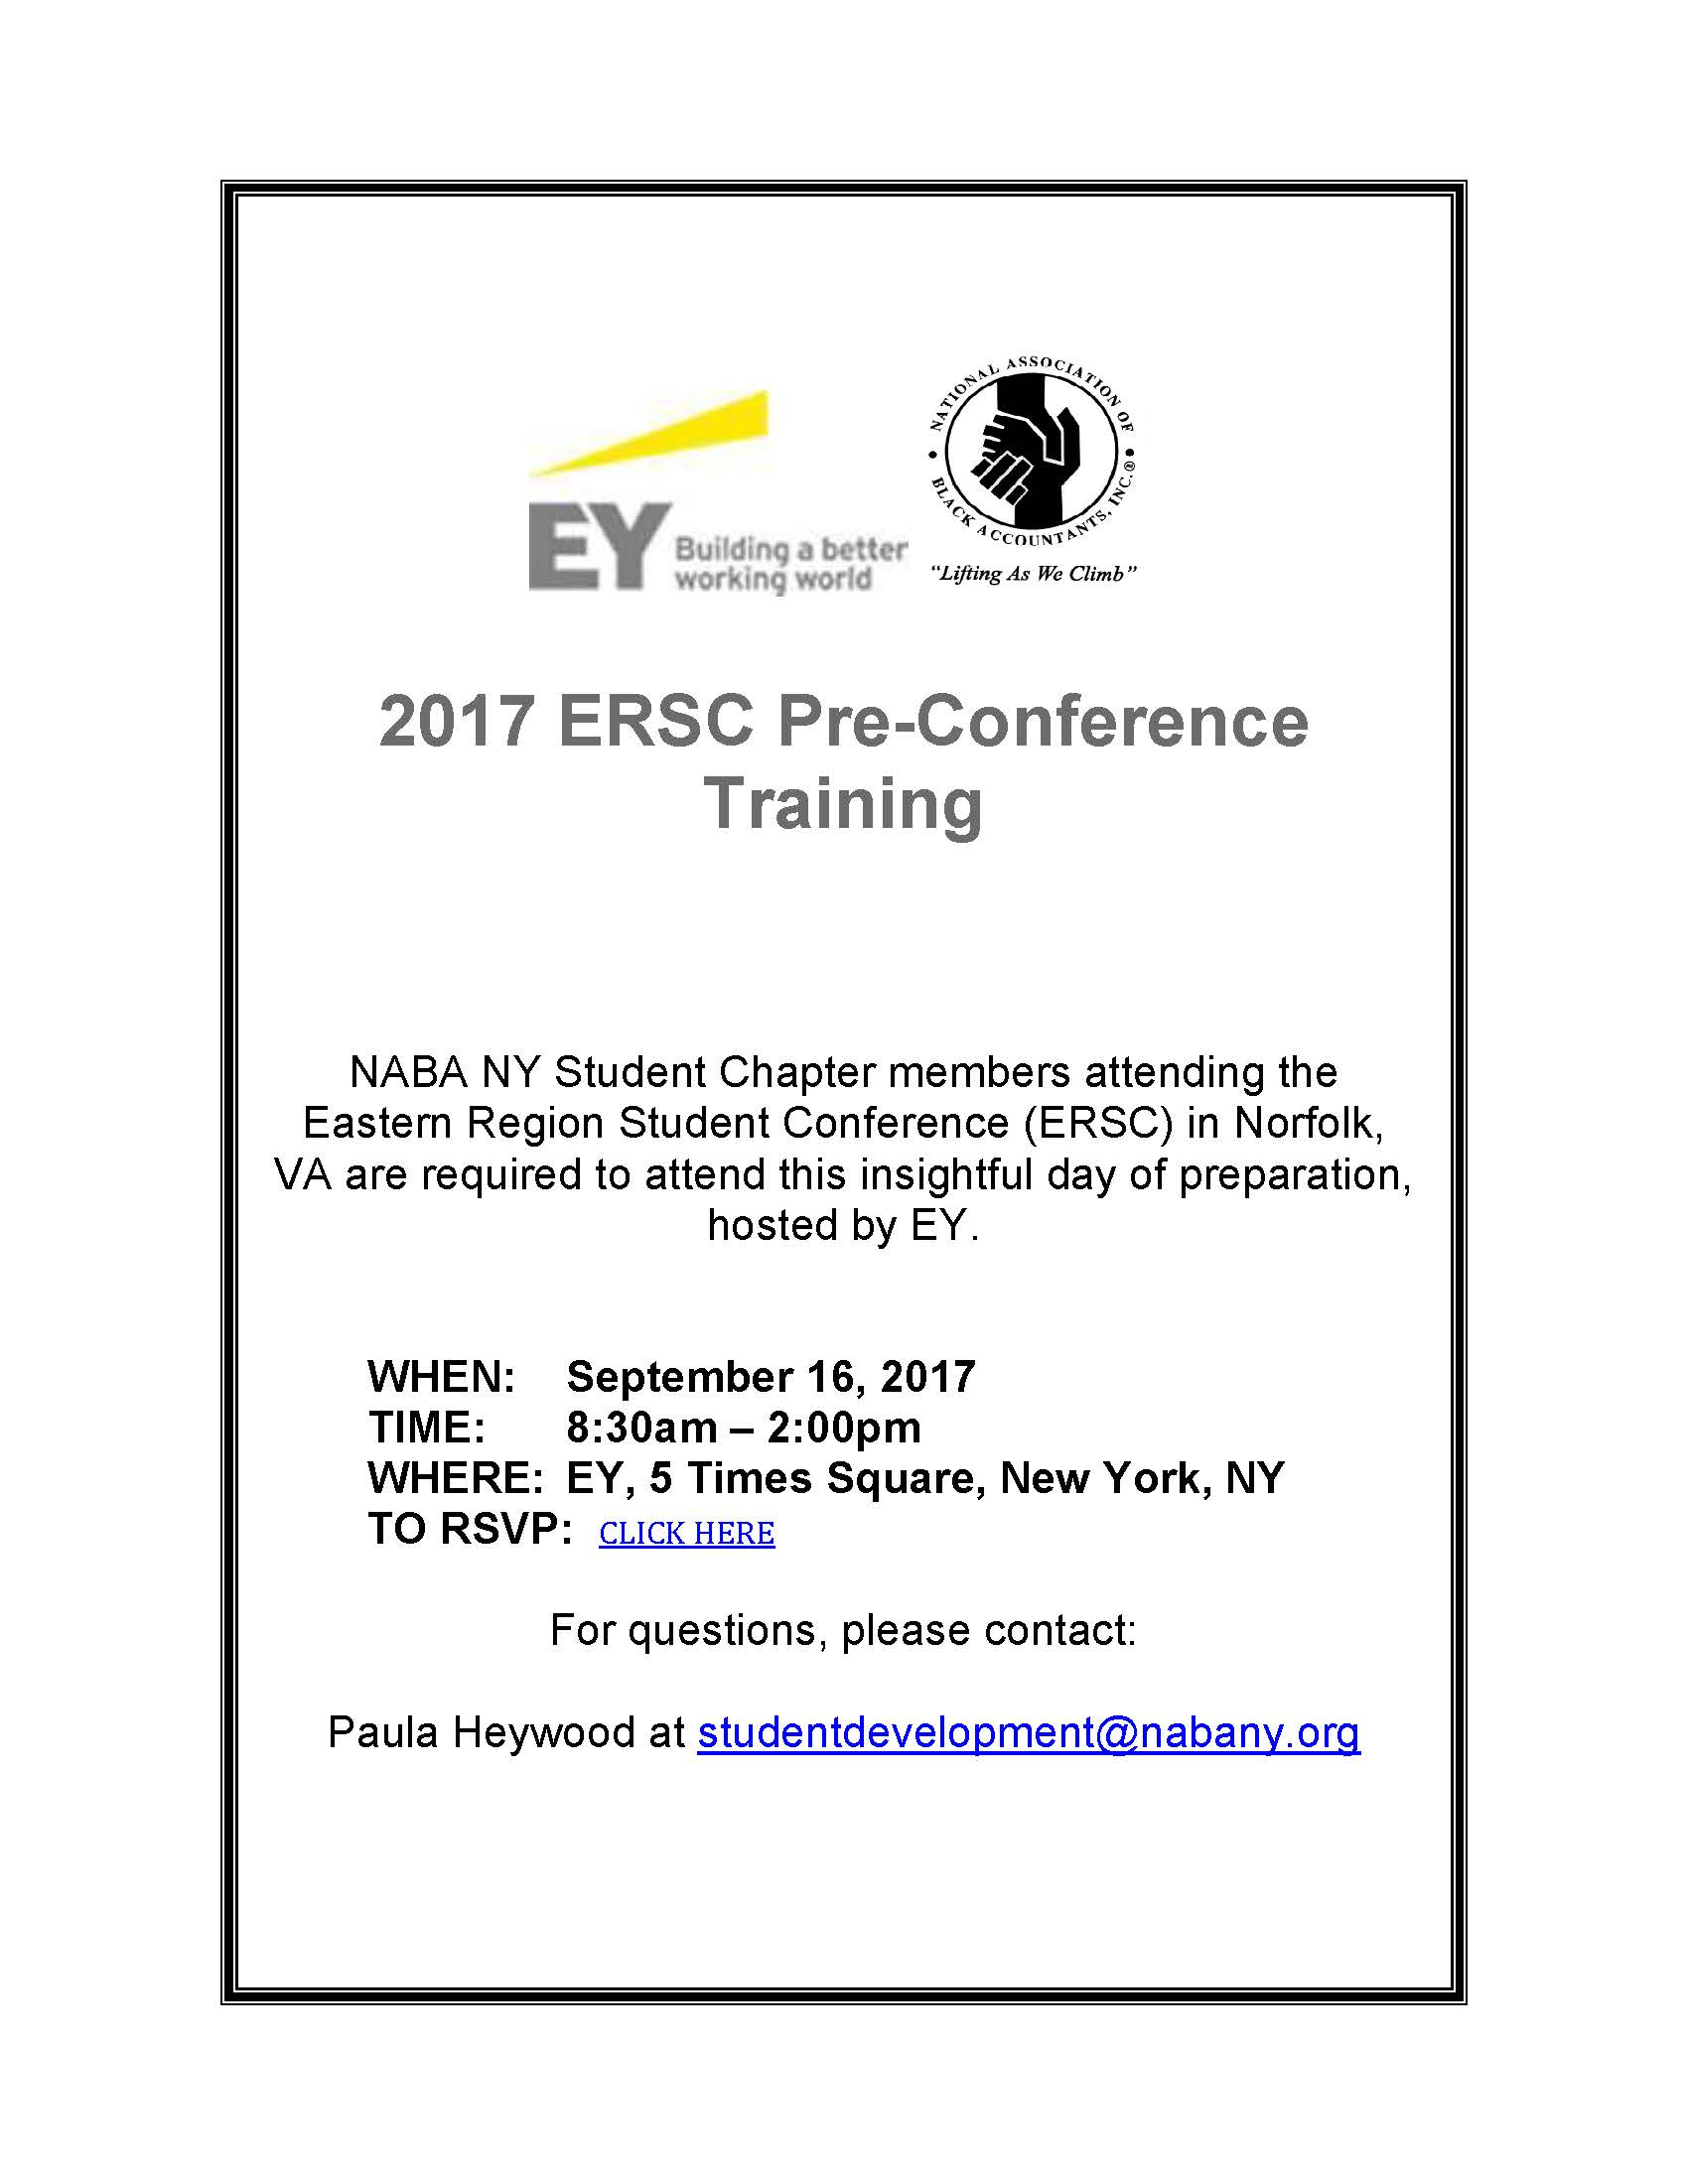 EY 2017 ERSC Pre Conf Training Updated.jpg